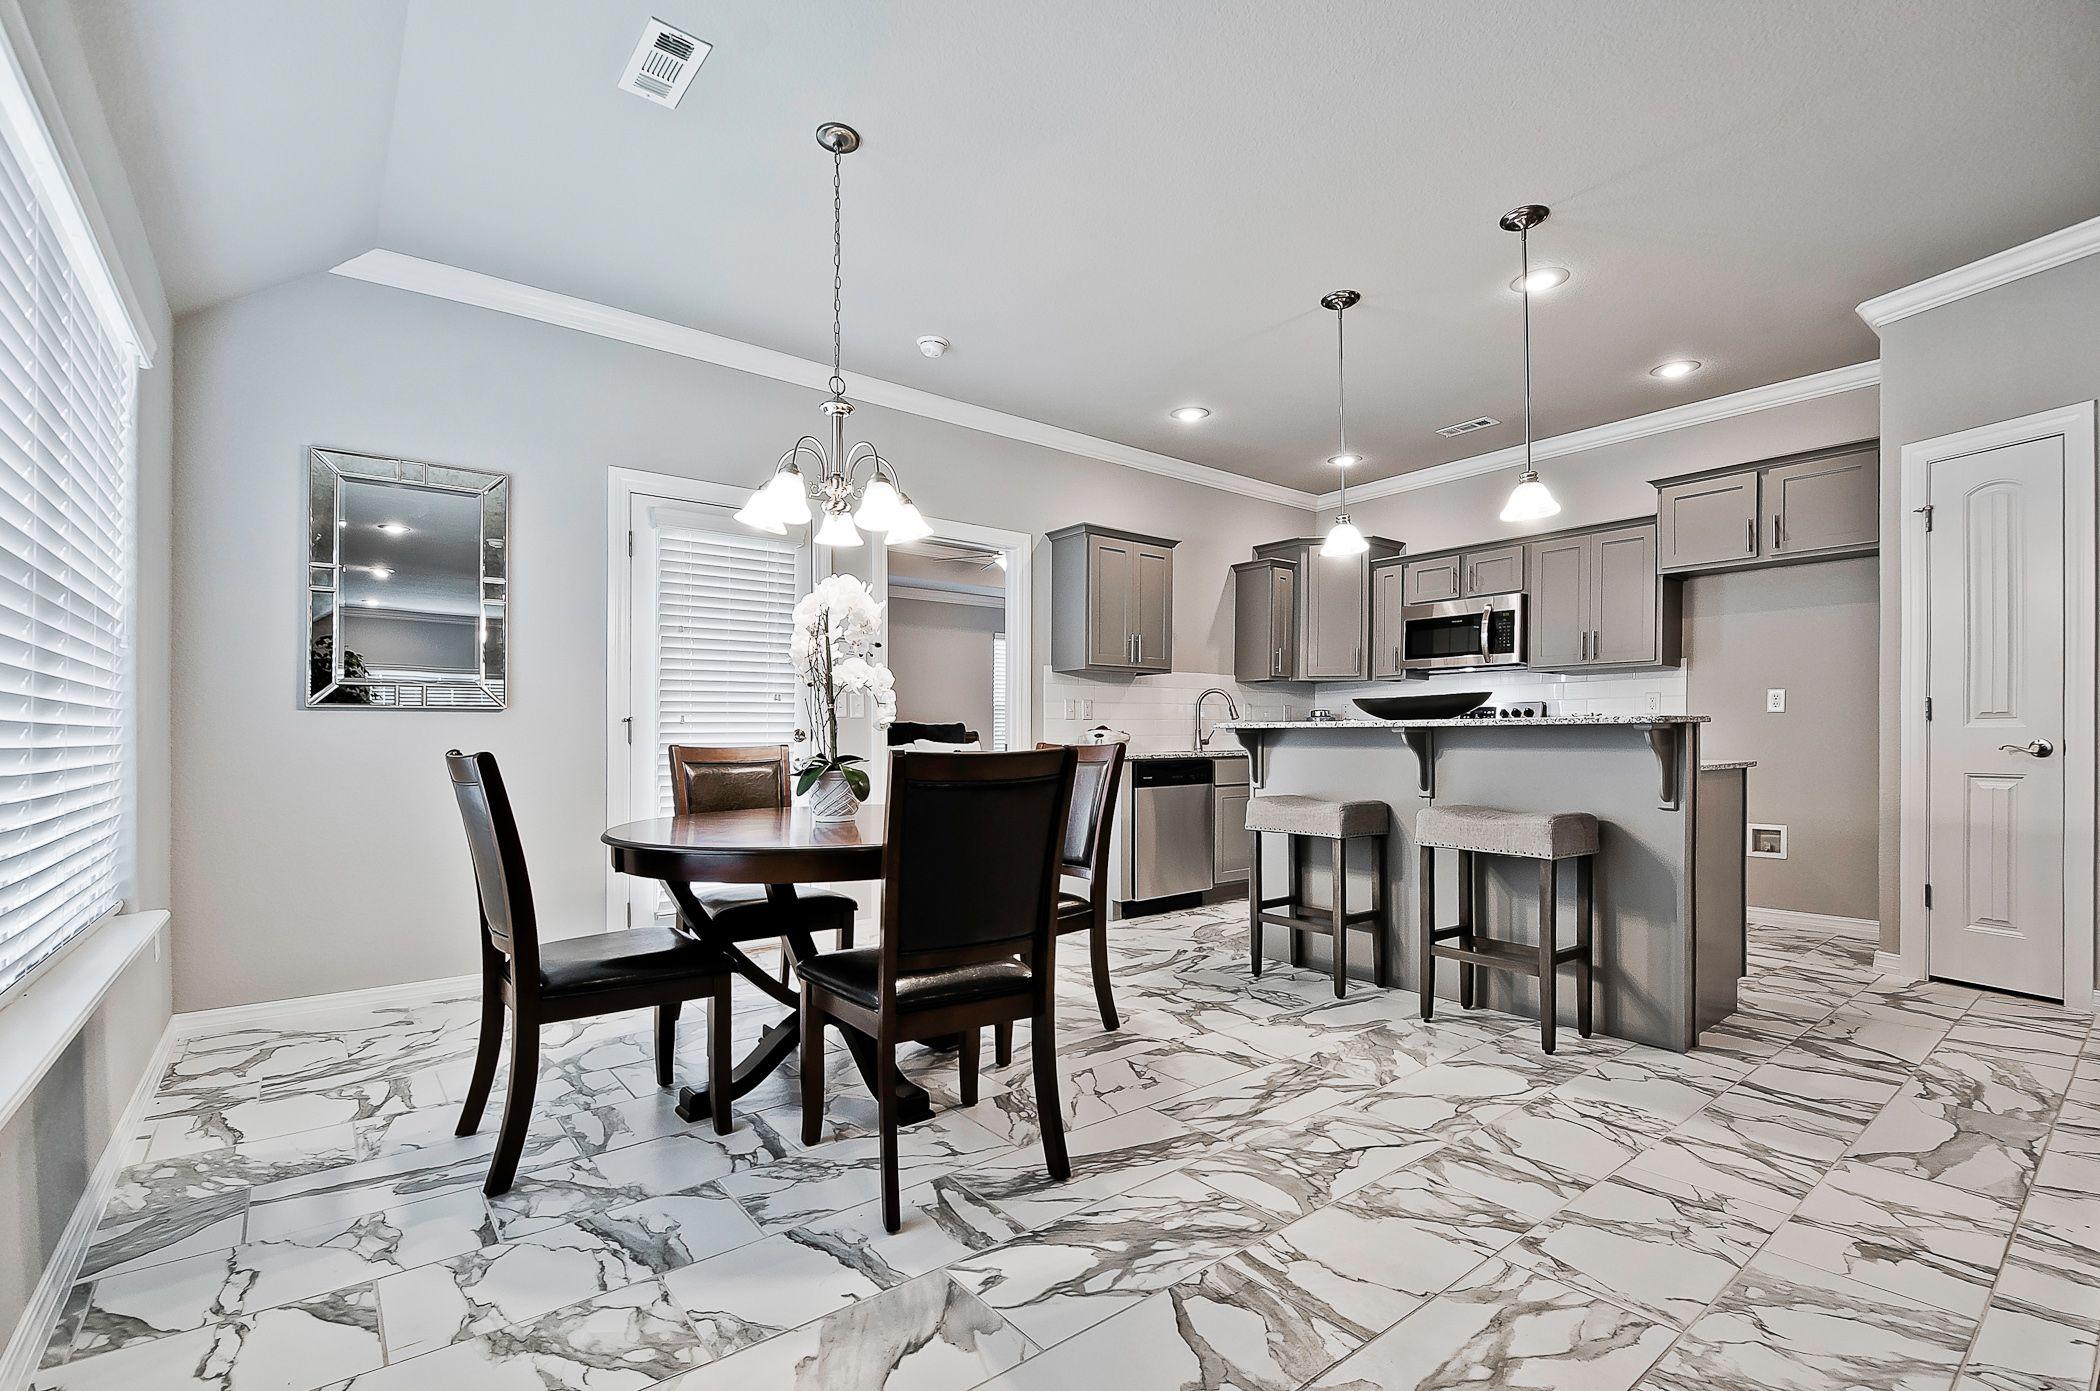 Kitchen featured in the Oak 1463 By Riverwood Homes - Arkansas in Fayetteville, AR